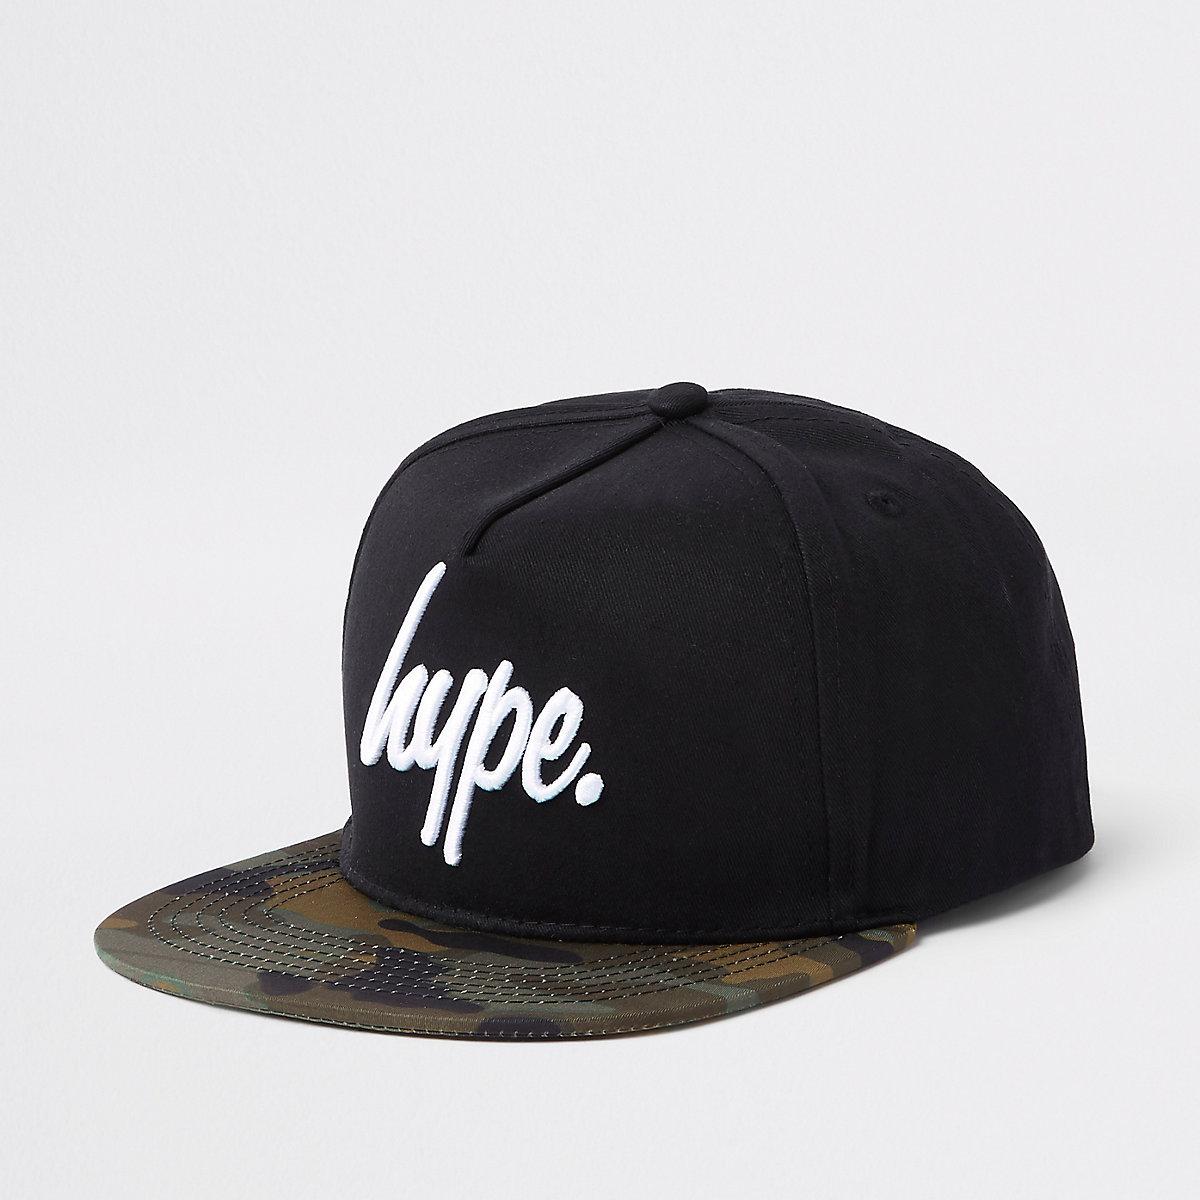 Hype – Schwarze Snapback-Kappe mit Camouflage